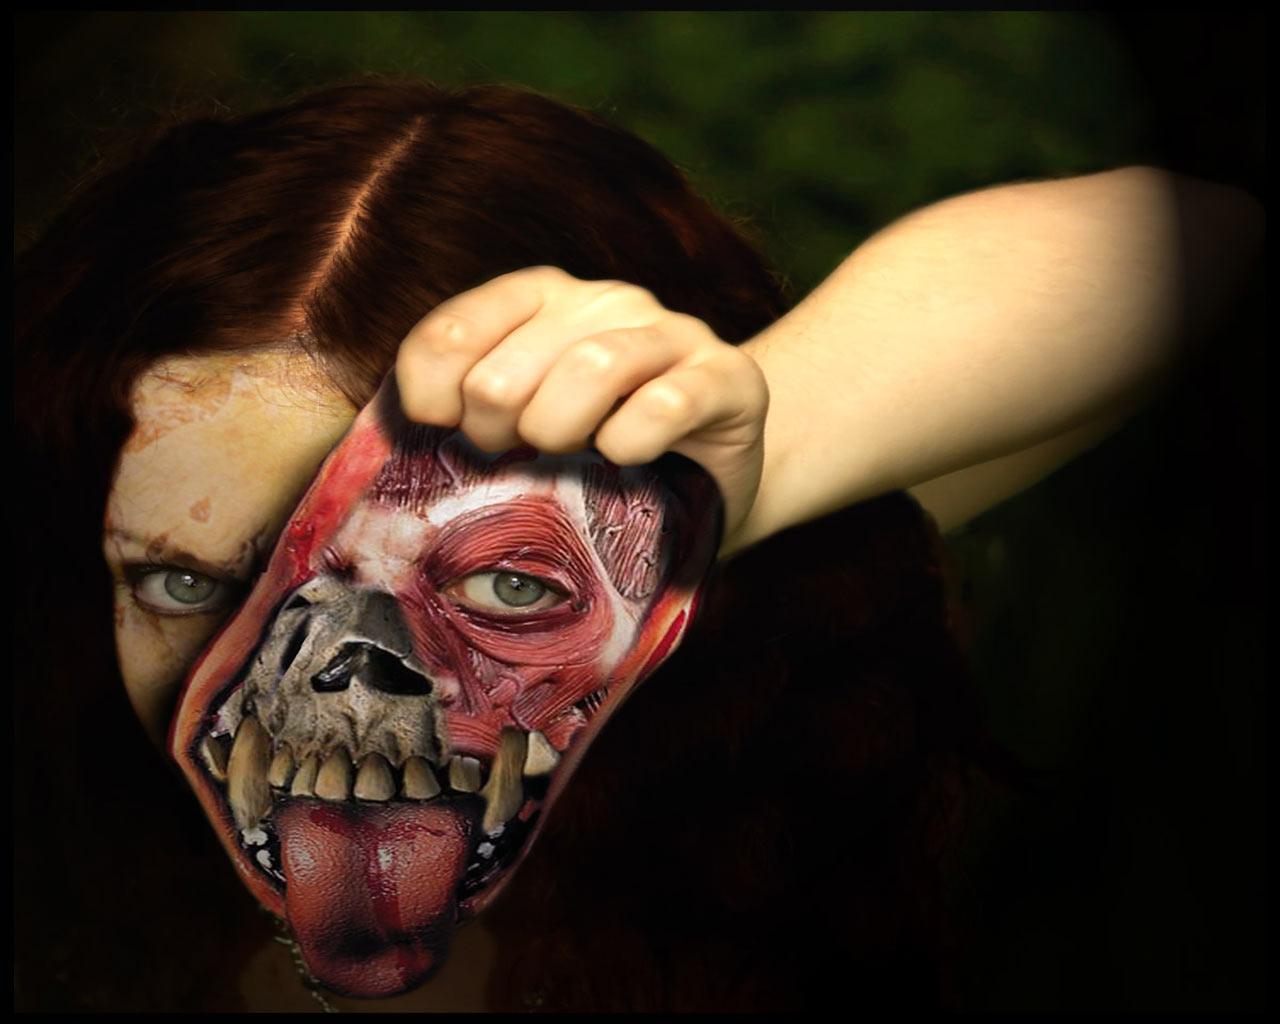 http://3.bp.blogspot.com/-G-PTvBfW0ks/TZRtlV57VzI/AAAAAAAAS9g/FBMF_LuwE6A/s1600/girly-scary-face-wallpaper.jpg